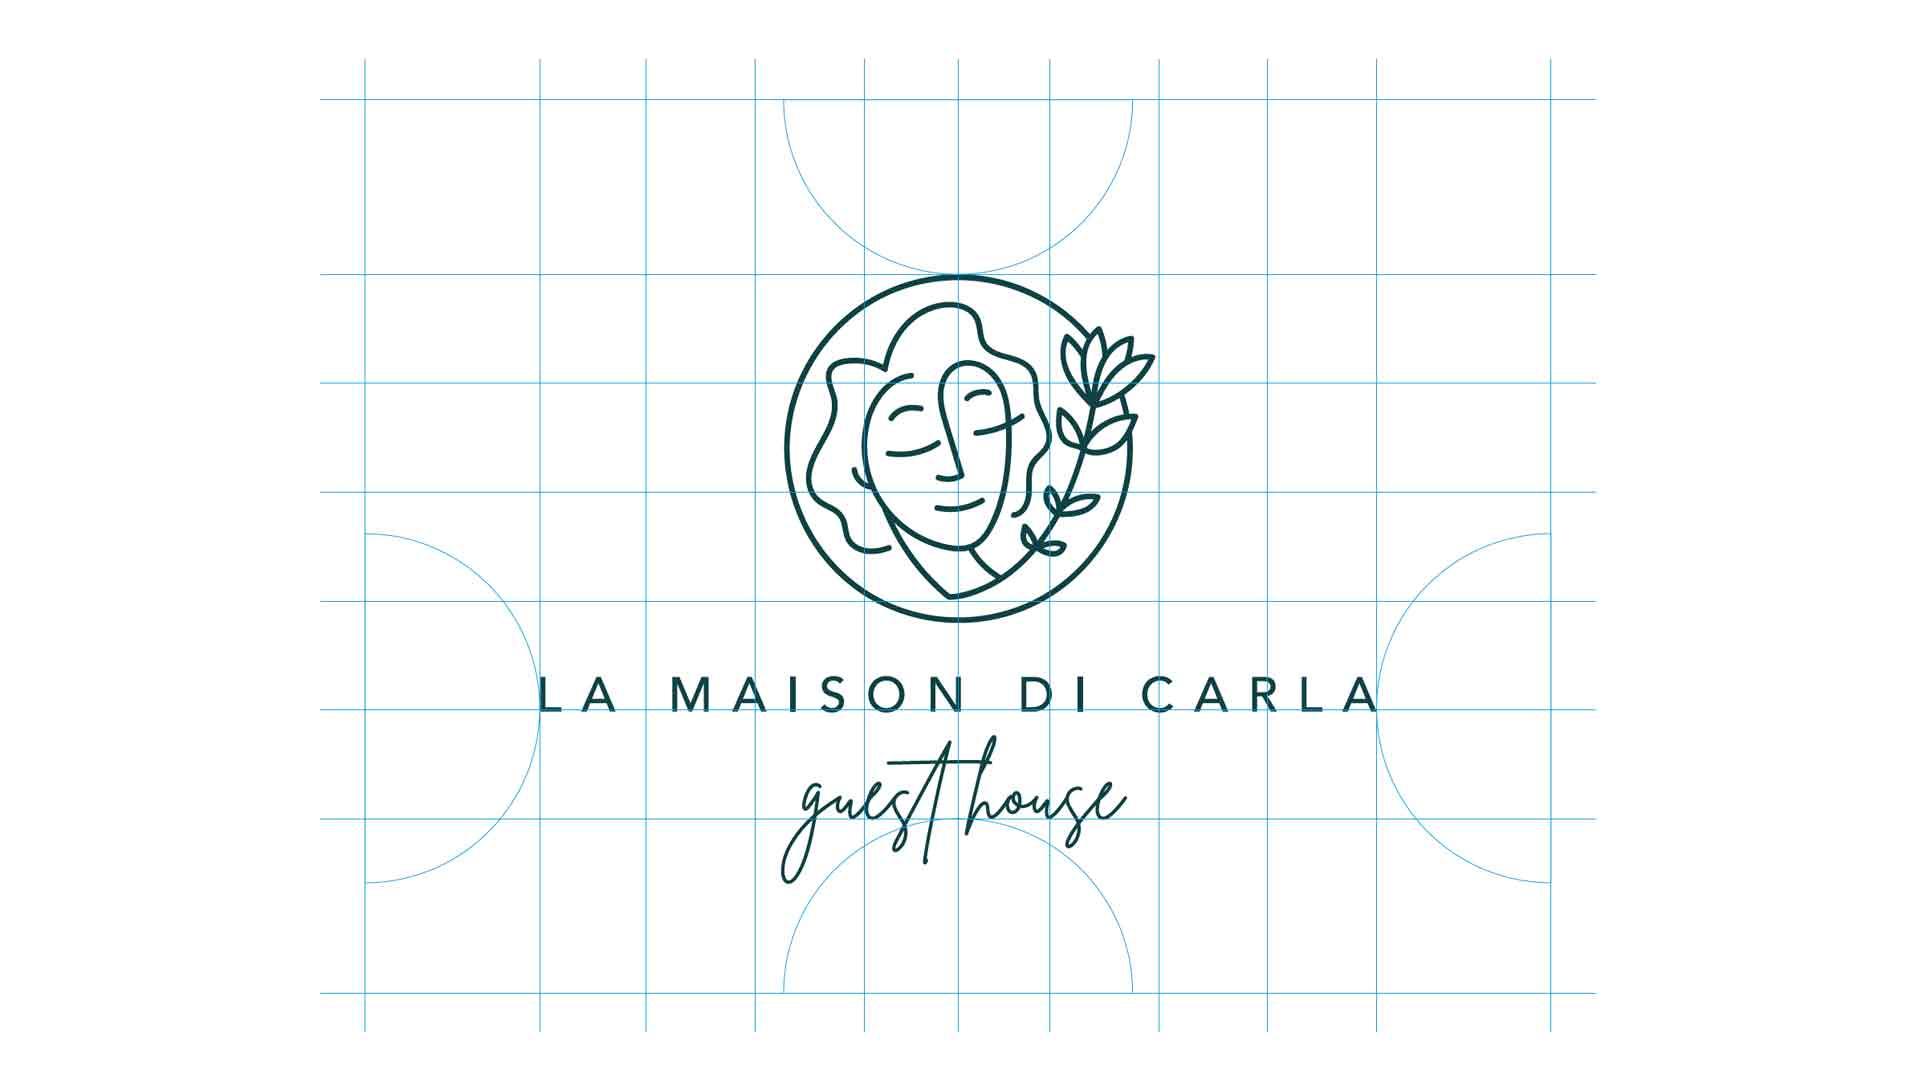 lamaisondicarla-logo-brand-image_01_gazpa